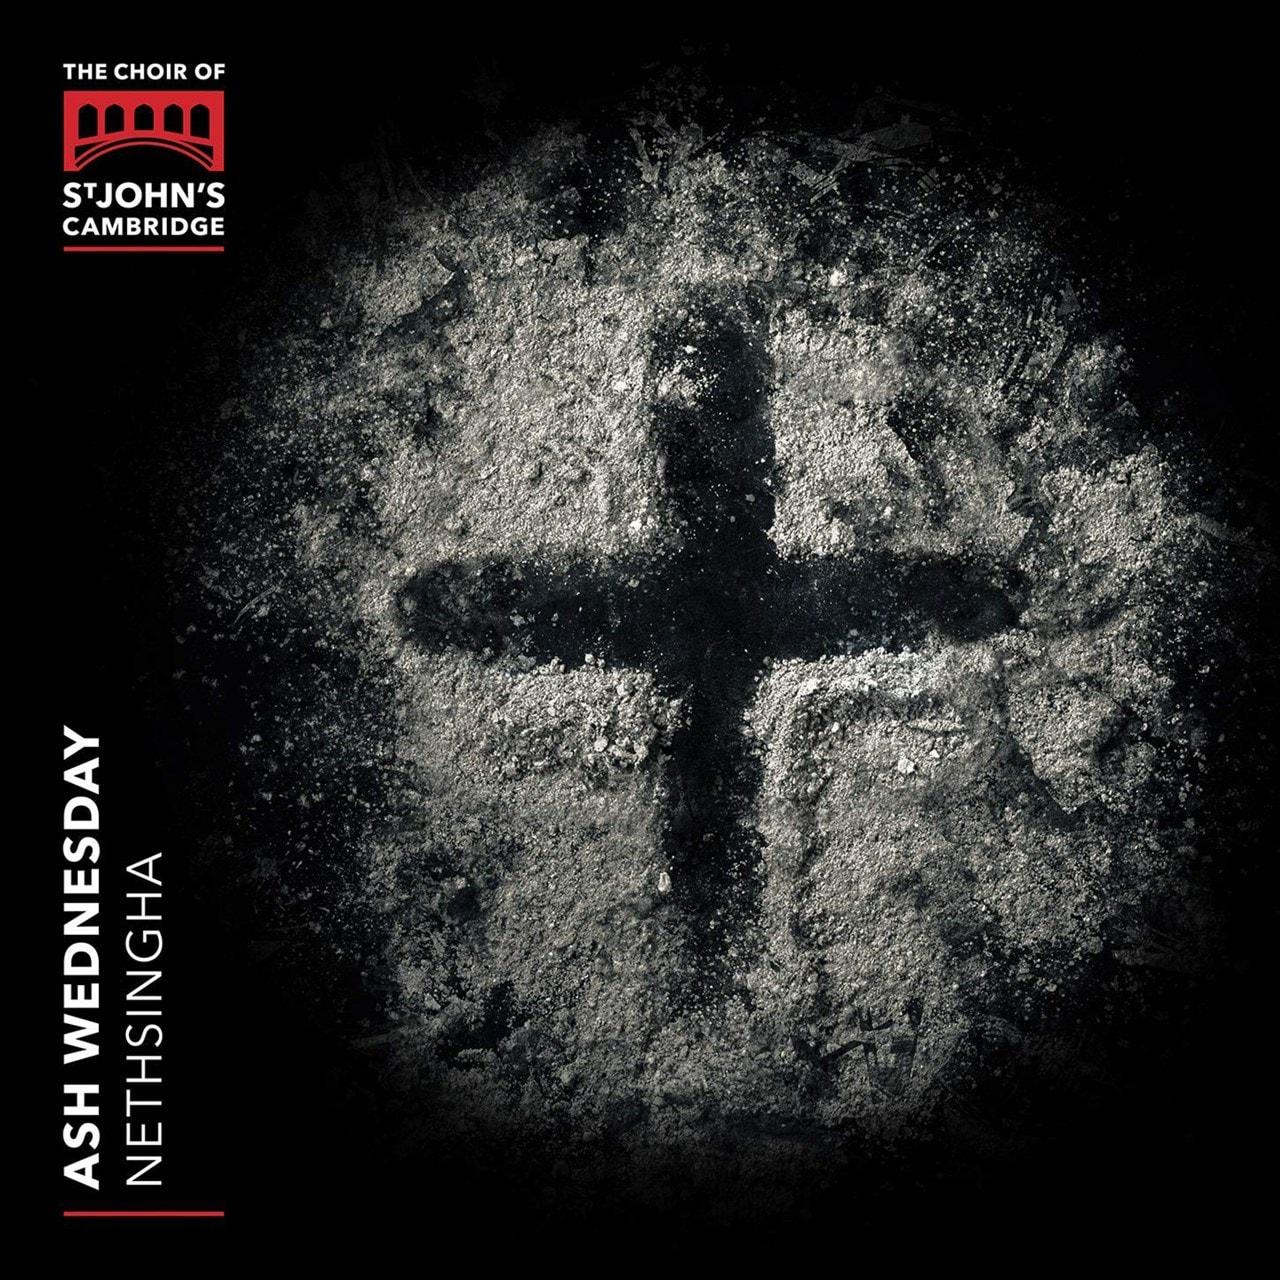 The Choir of St. John's Cambridge: Ash Wednesday - 1